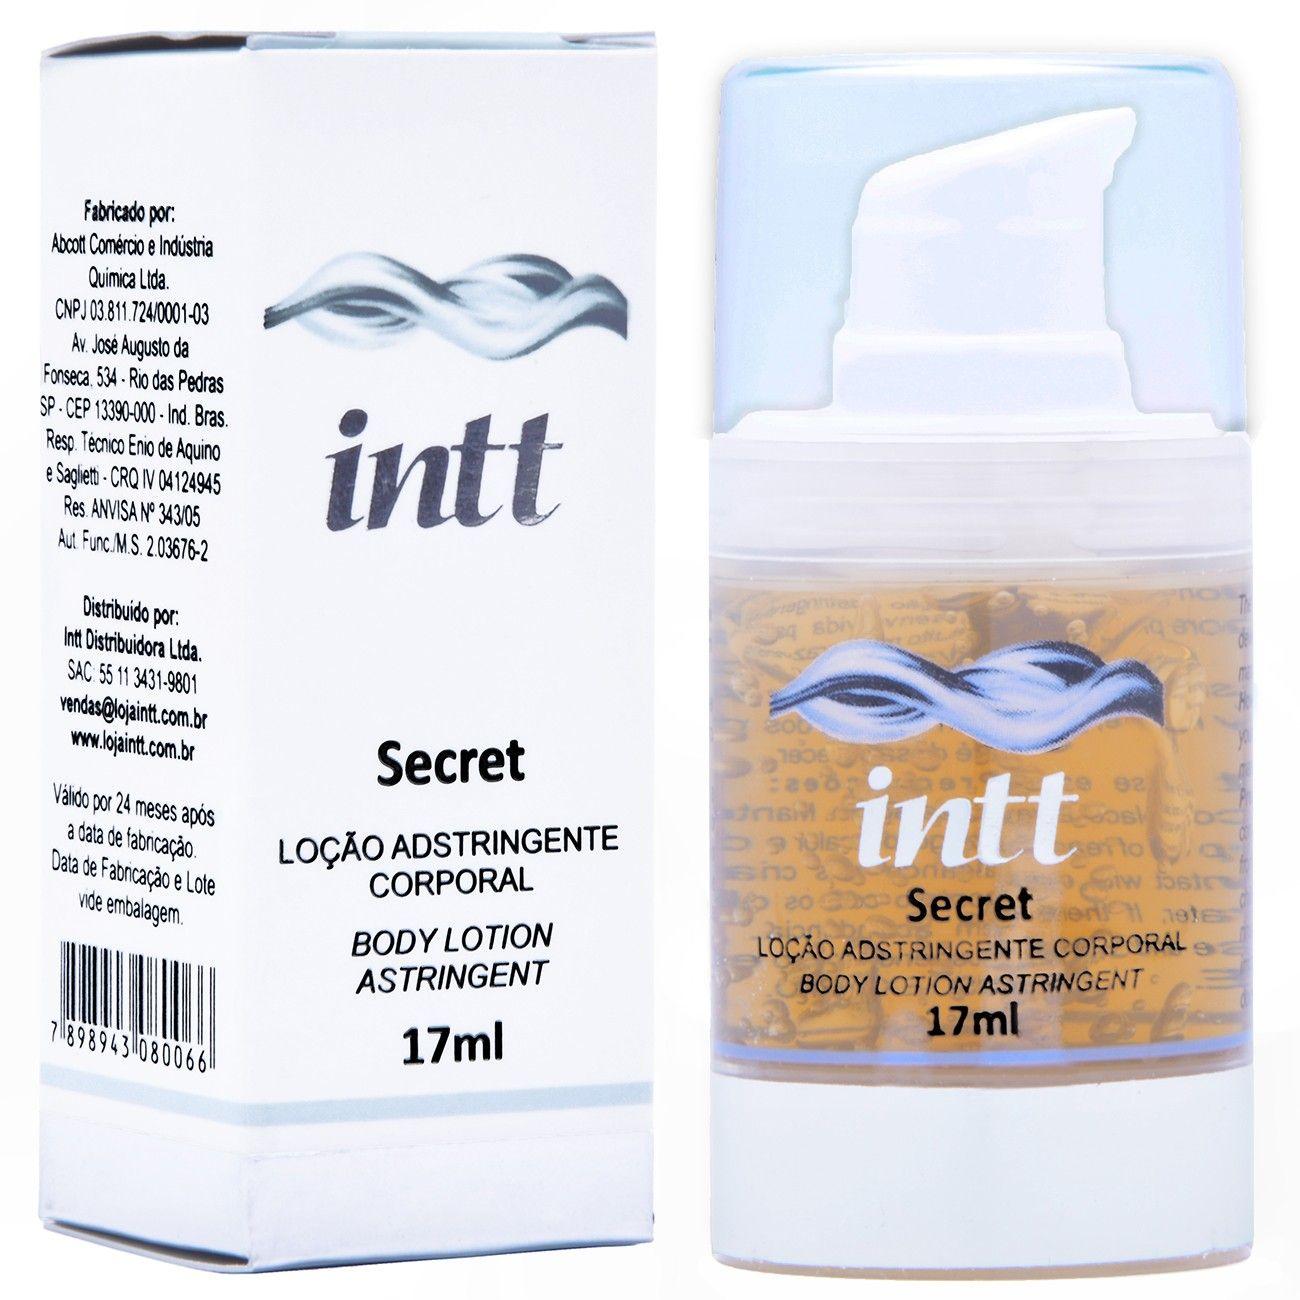 Gel Adstringente Vaginal Secret 17ml – Intt